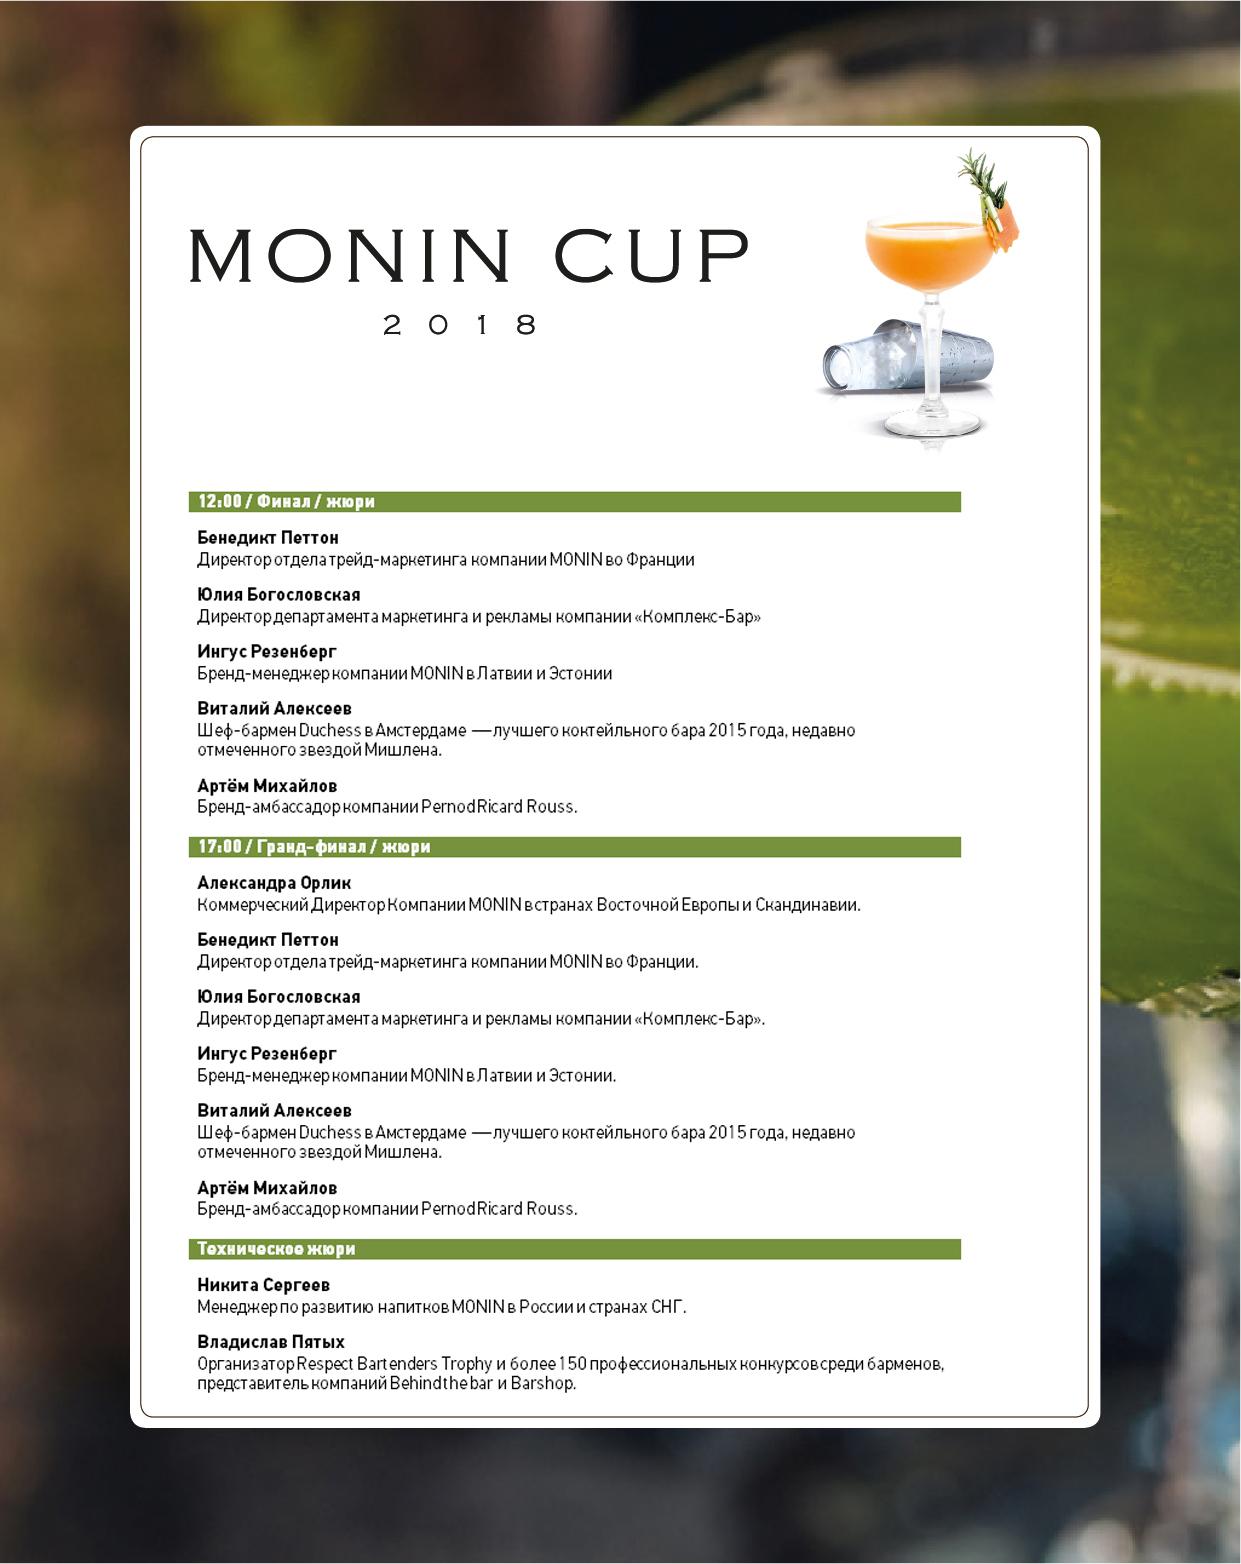 жюри MONIN Cup 2018